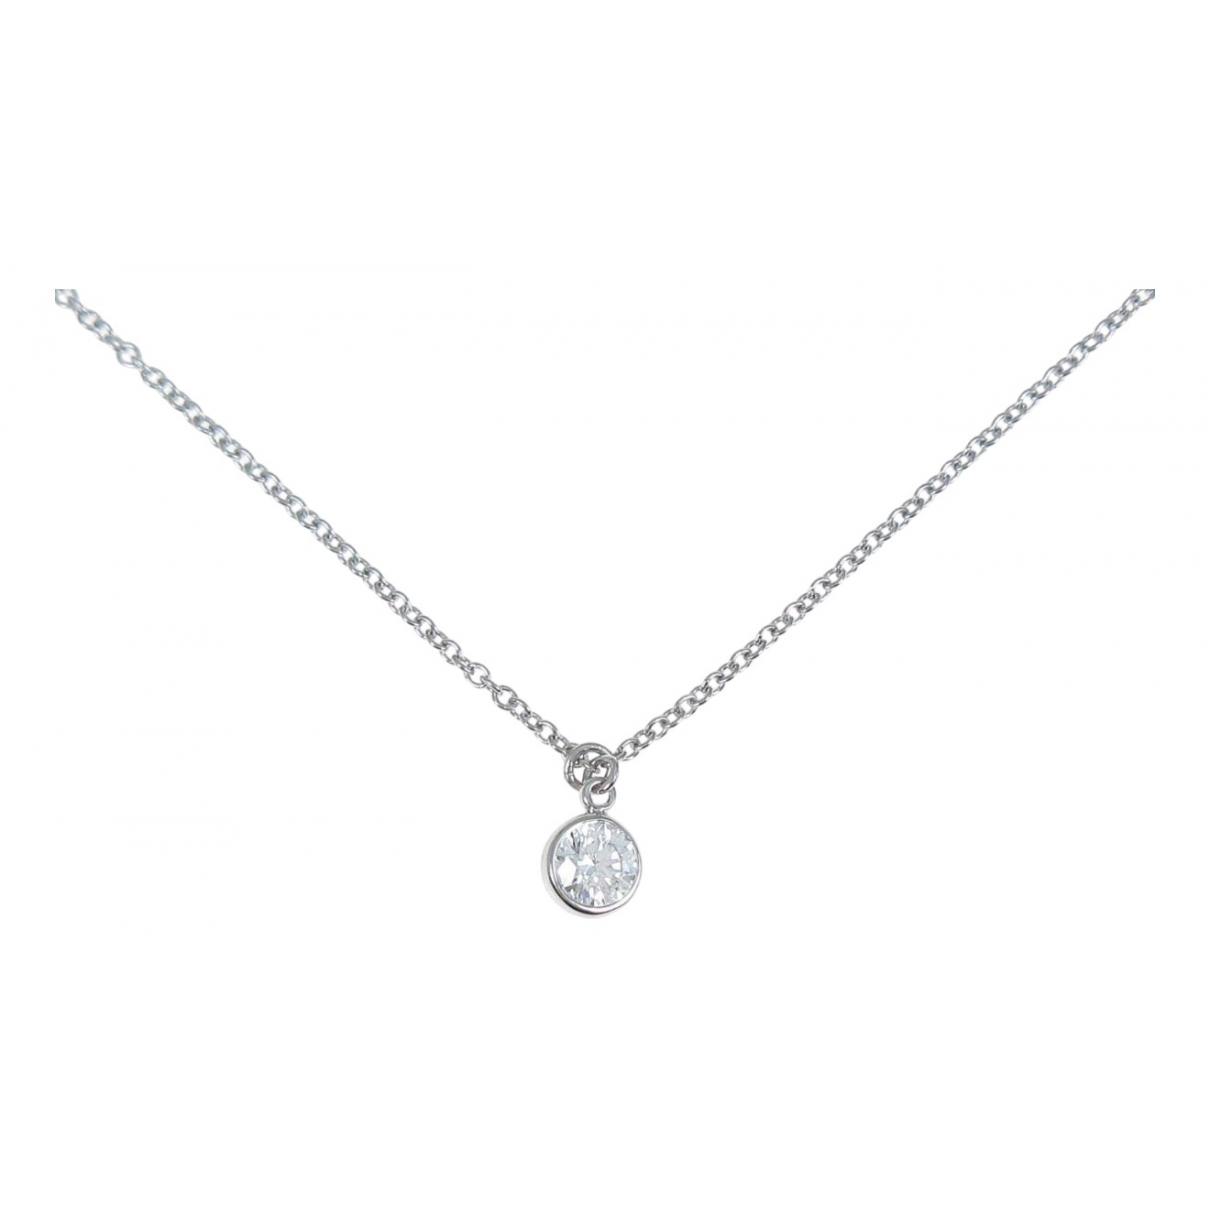 Tiffany & Co Elsa Peretti  Kette in  Silber Weissgold